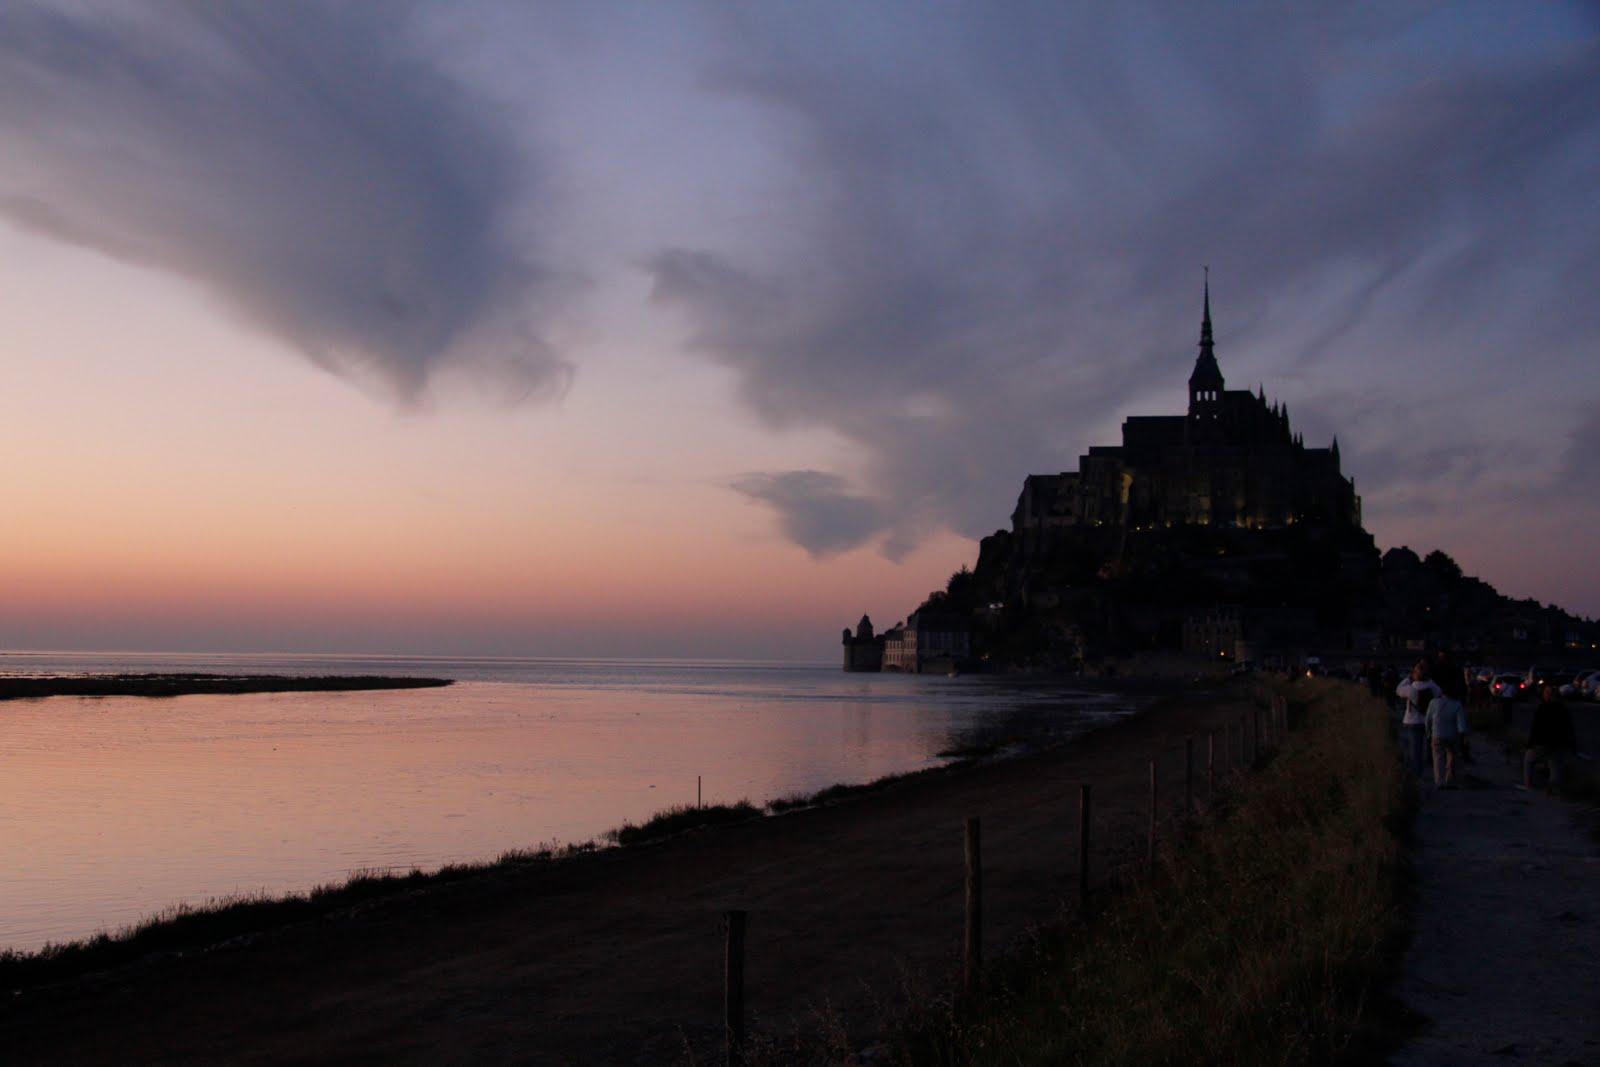 Hotel Ibis Avranches Baie Du Mont Saint Michel